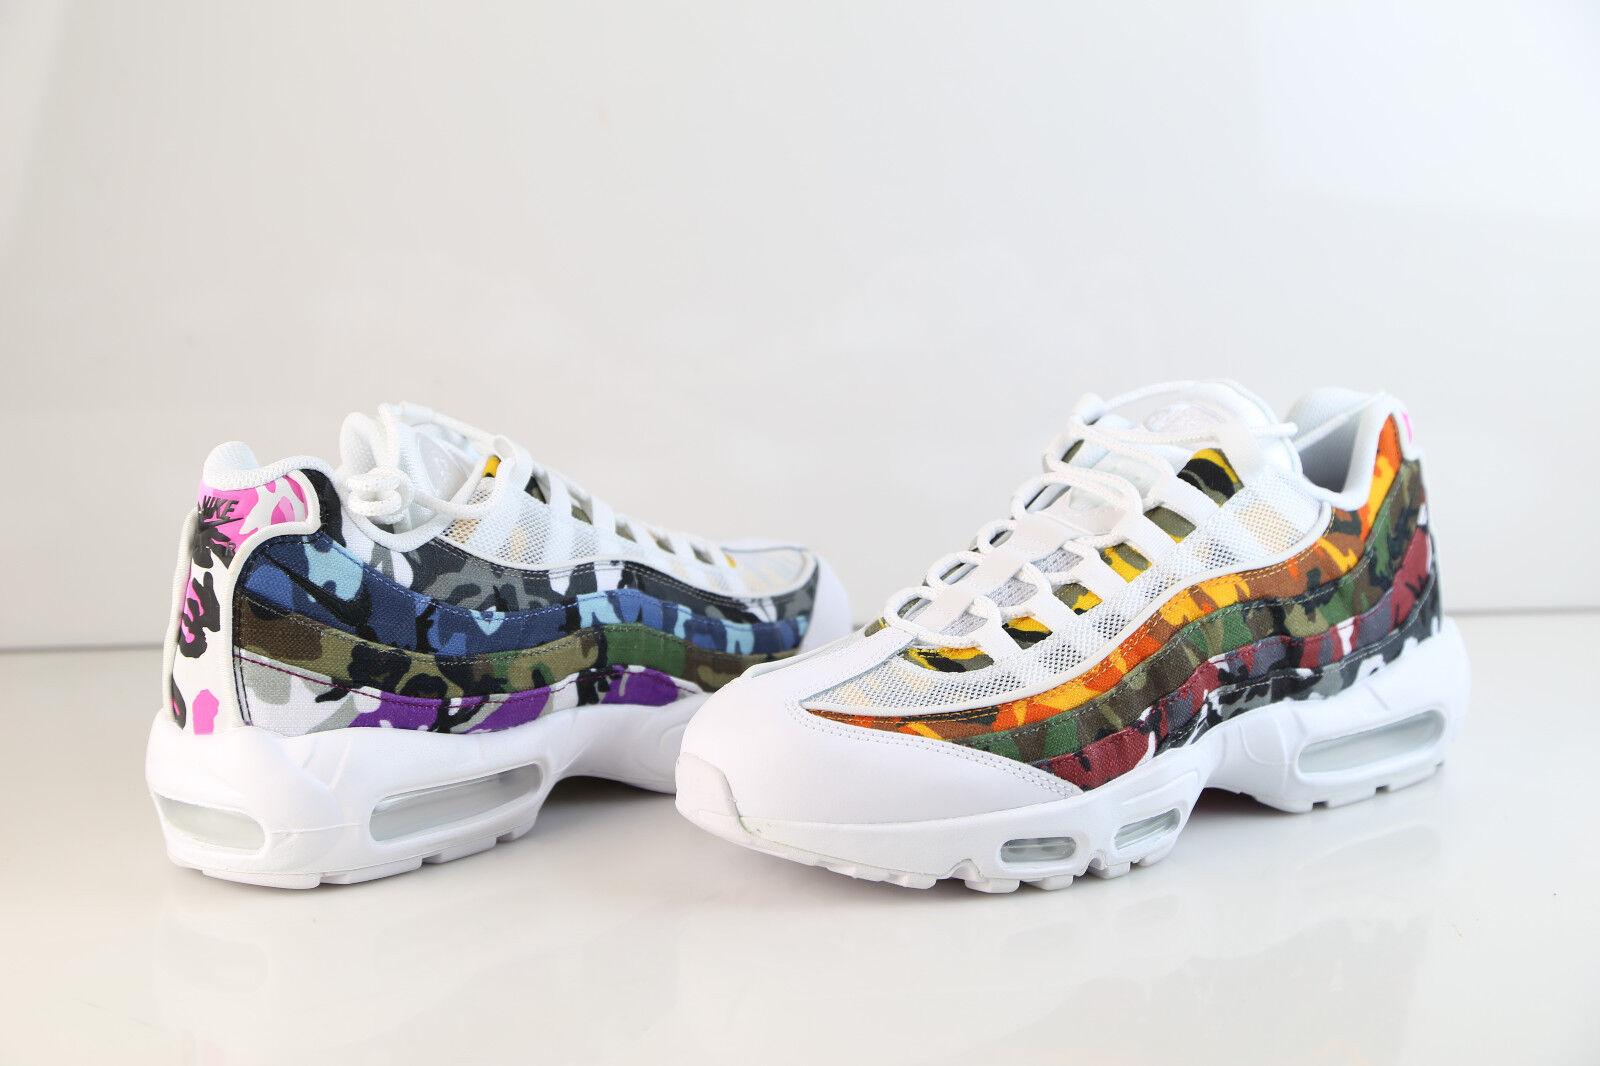 Nike Air Max 95 ERDL Party blanc Multicolor Camo AR4473-100 1 8-13 qs nsw lab 1 AR4473-100 c4c7e0